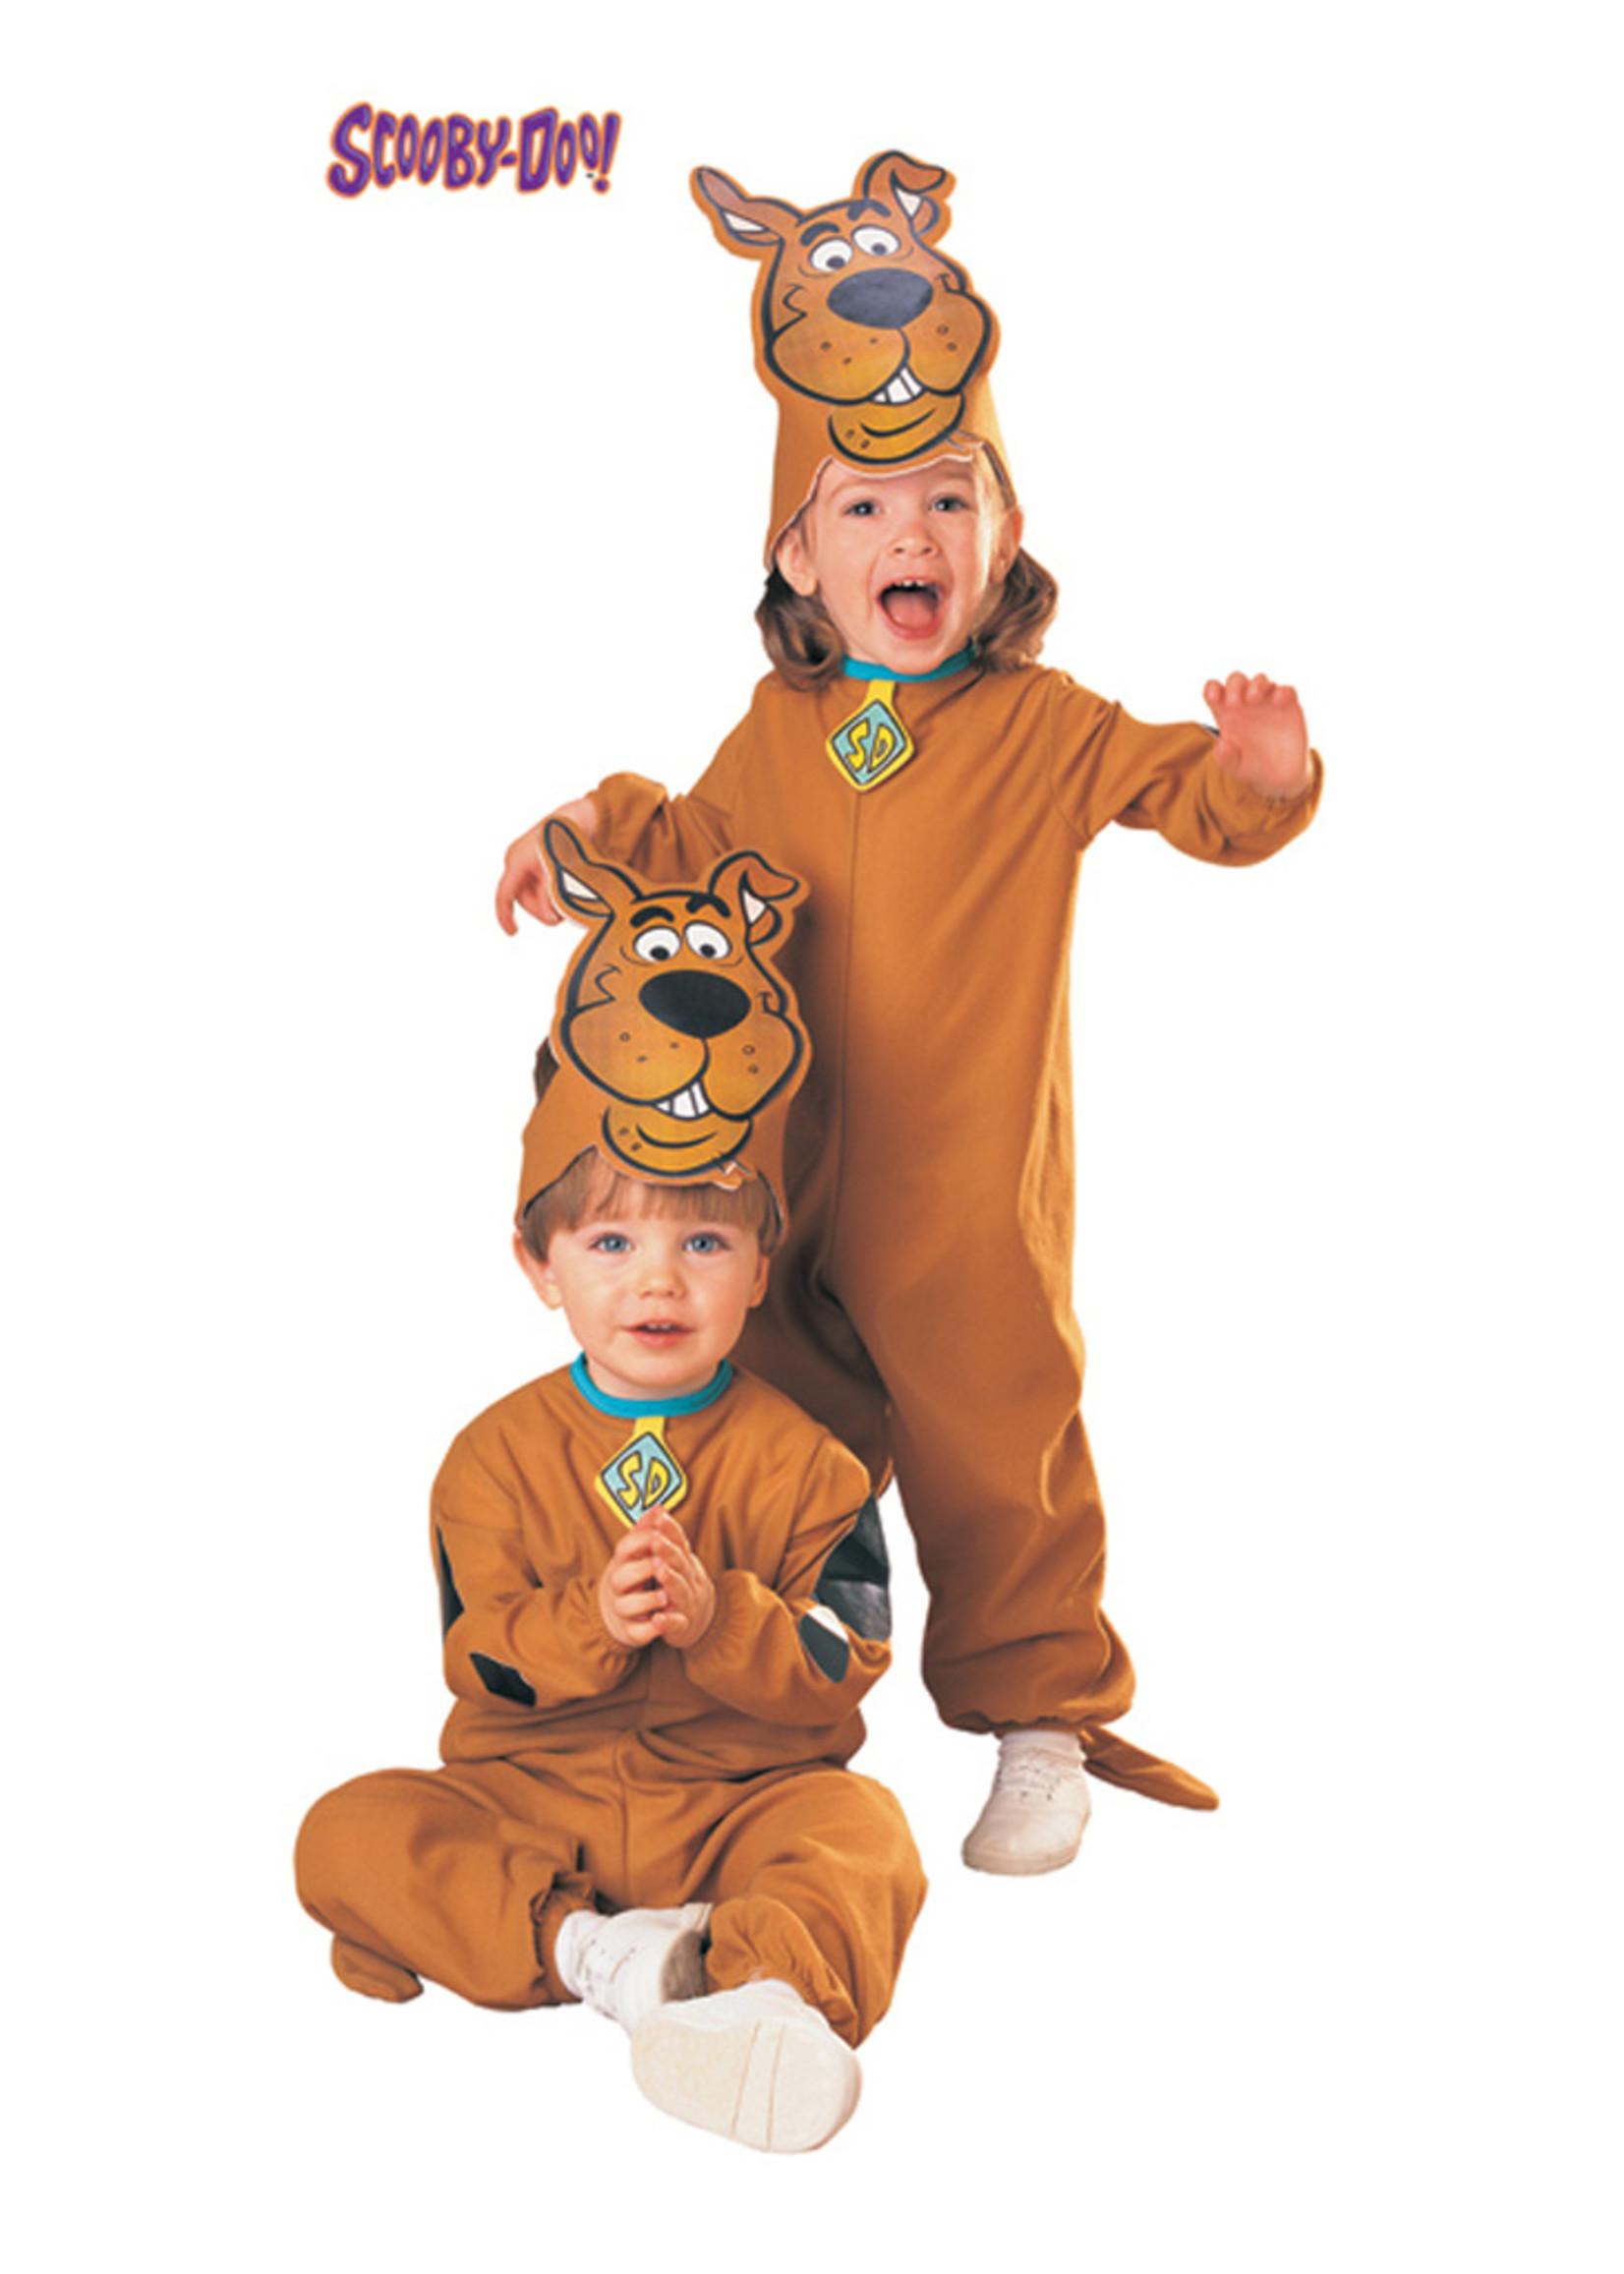 Scooby-Doo Costume - Toddler